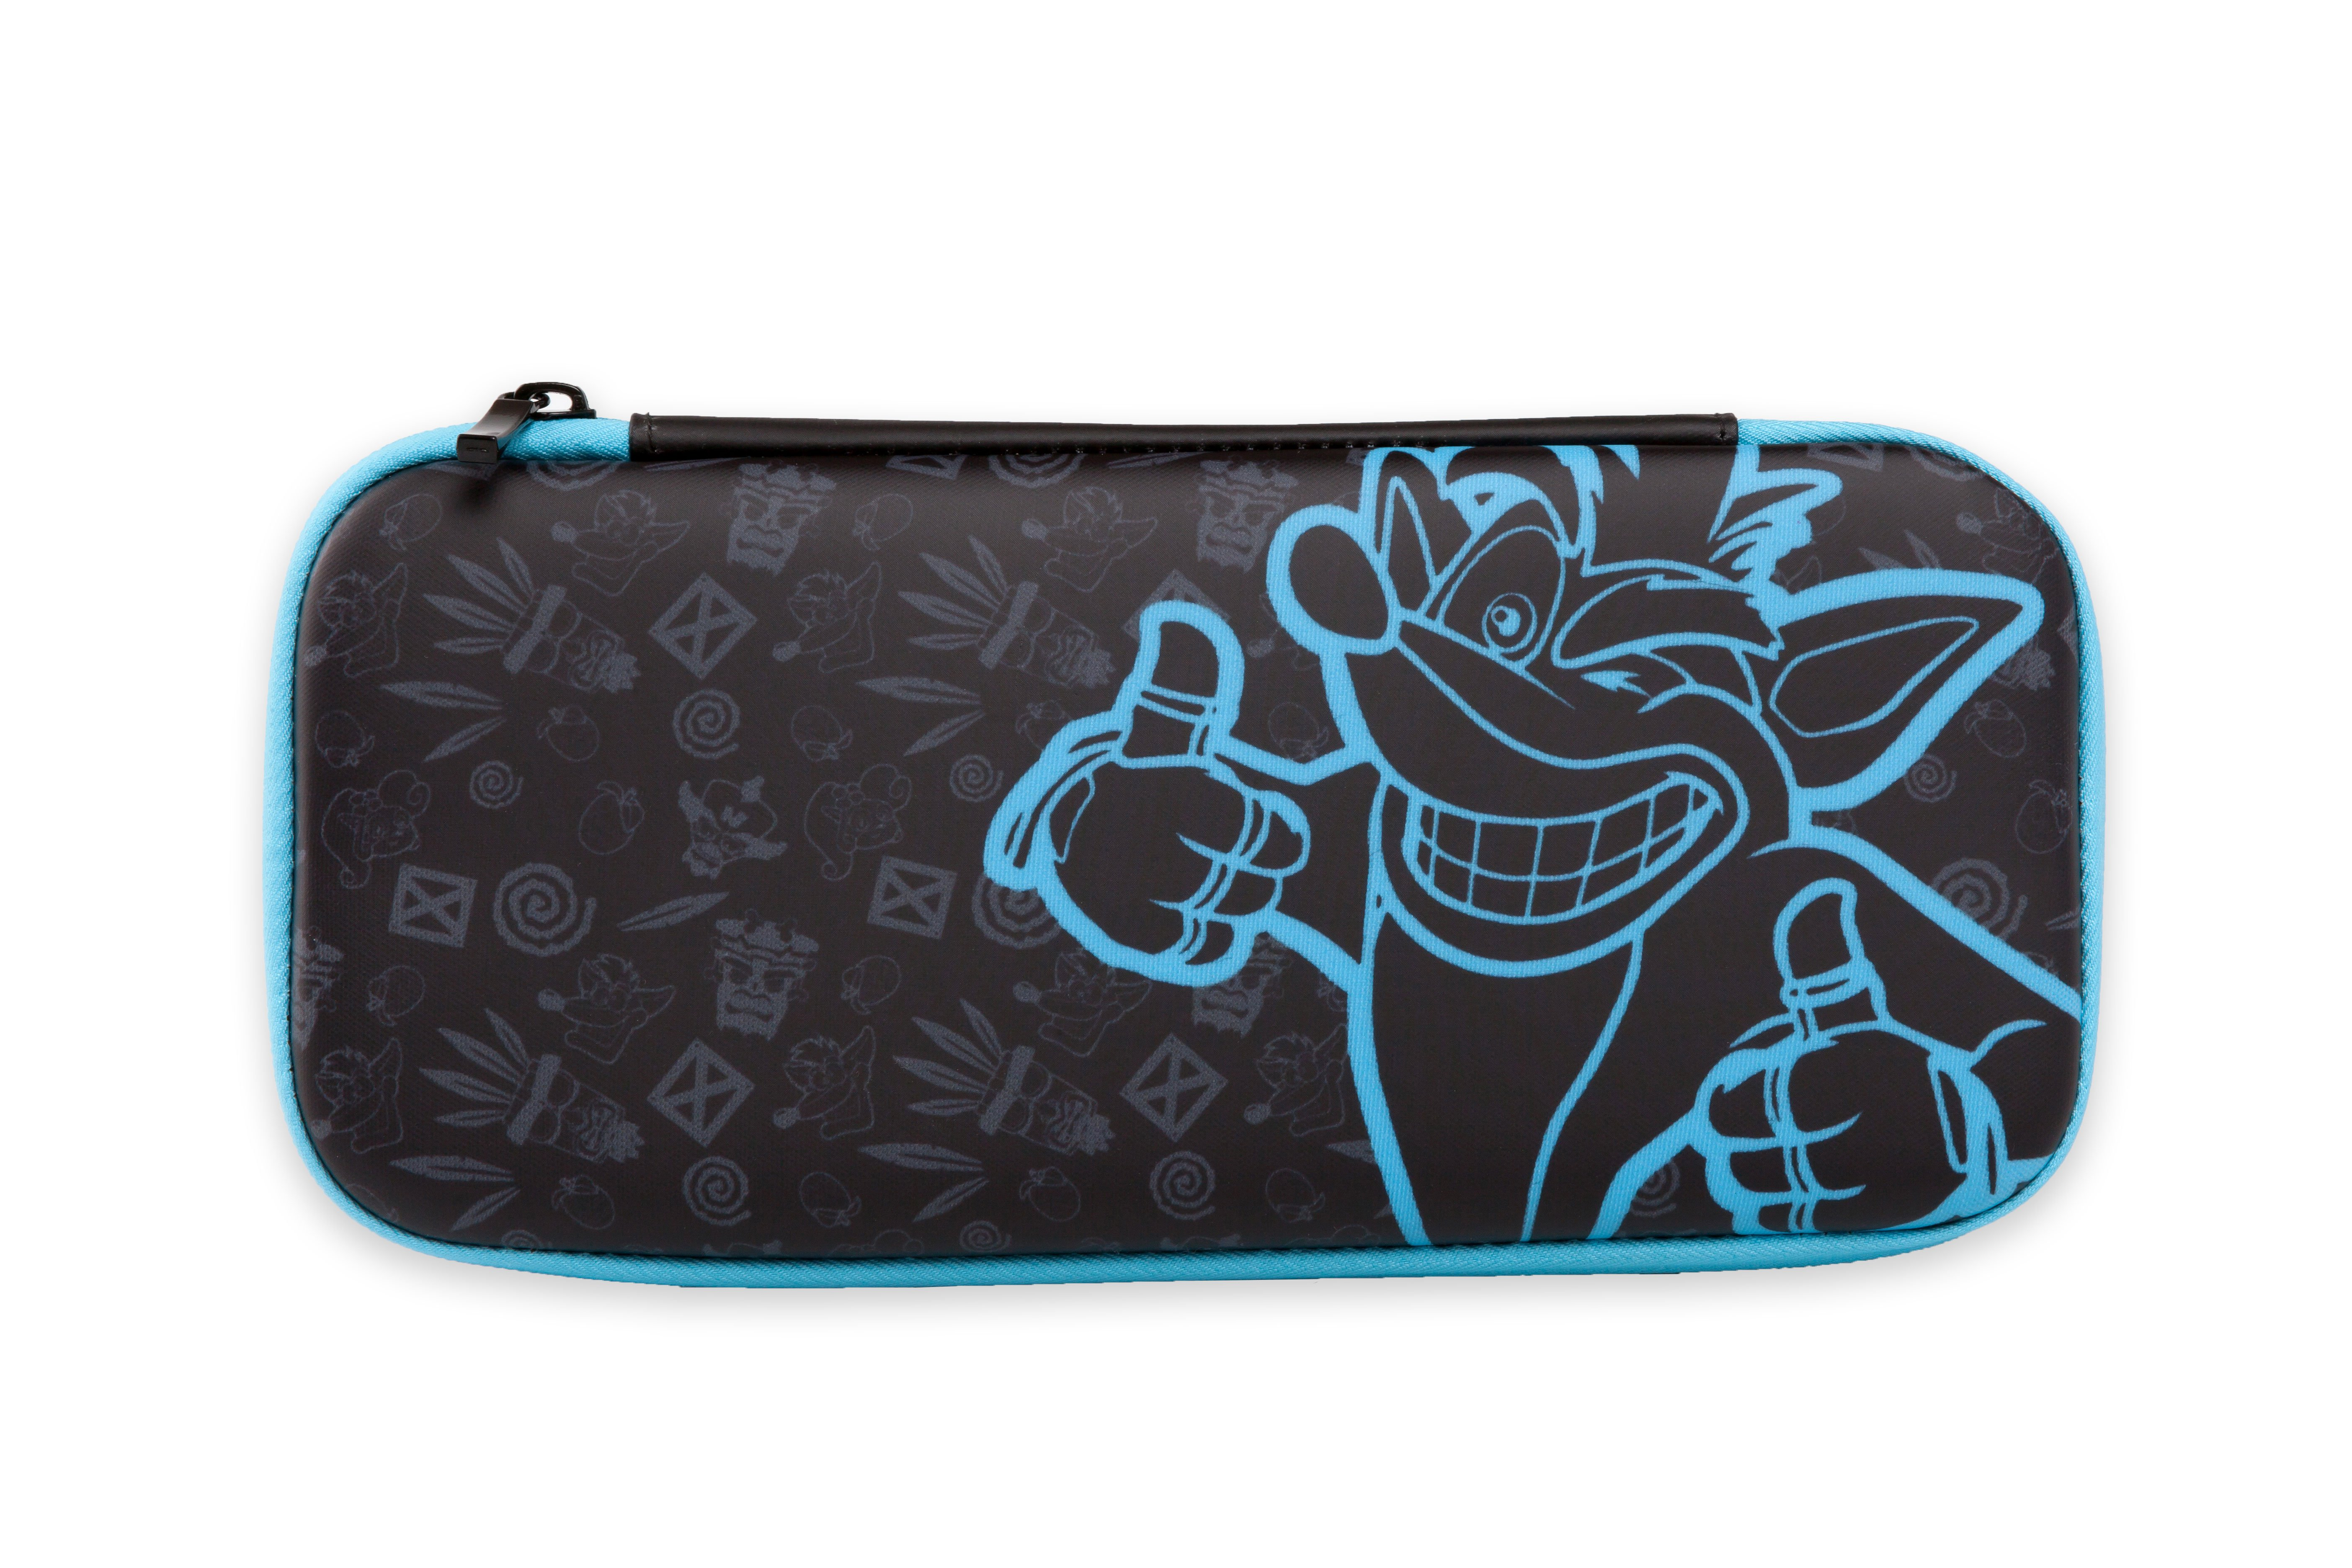 PowerA Travel Kit - Crash Bandicoot